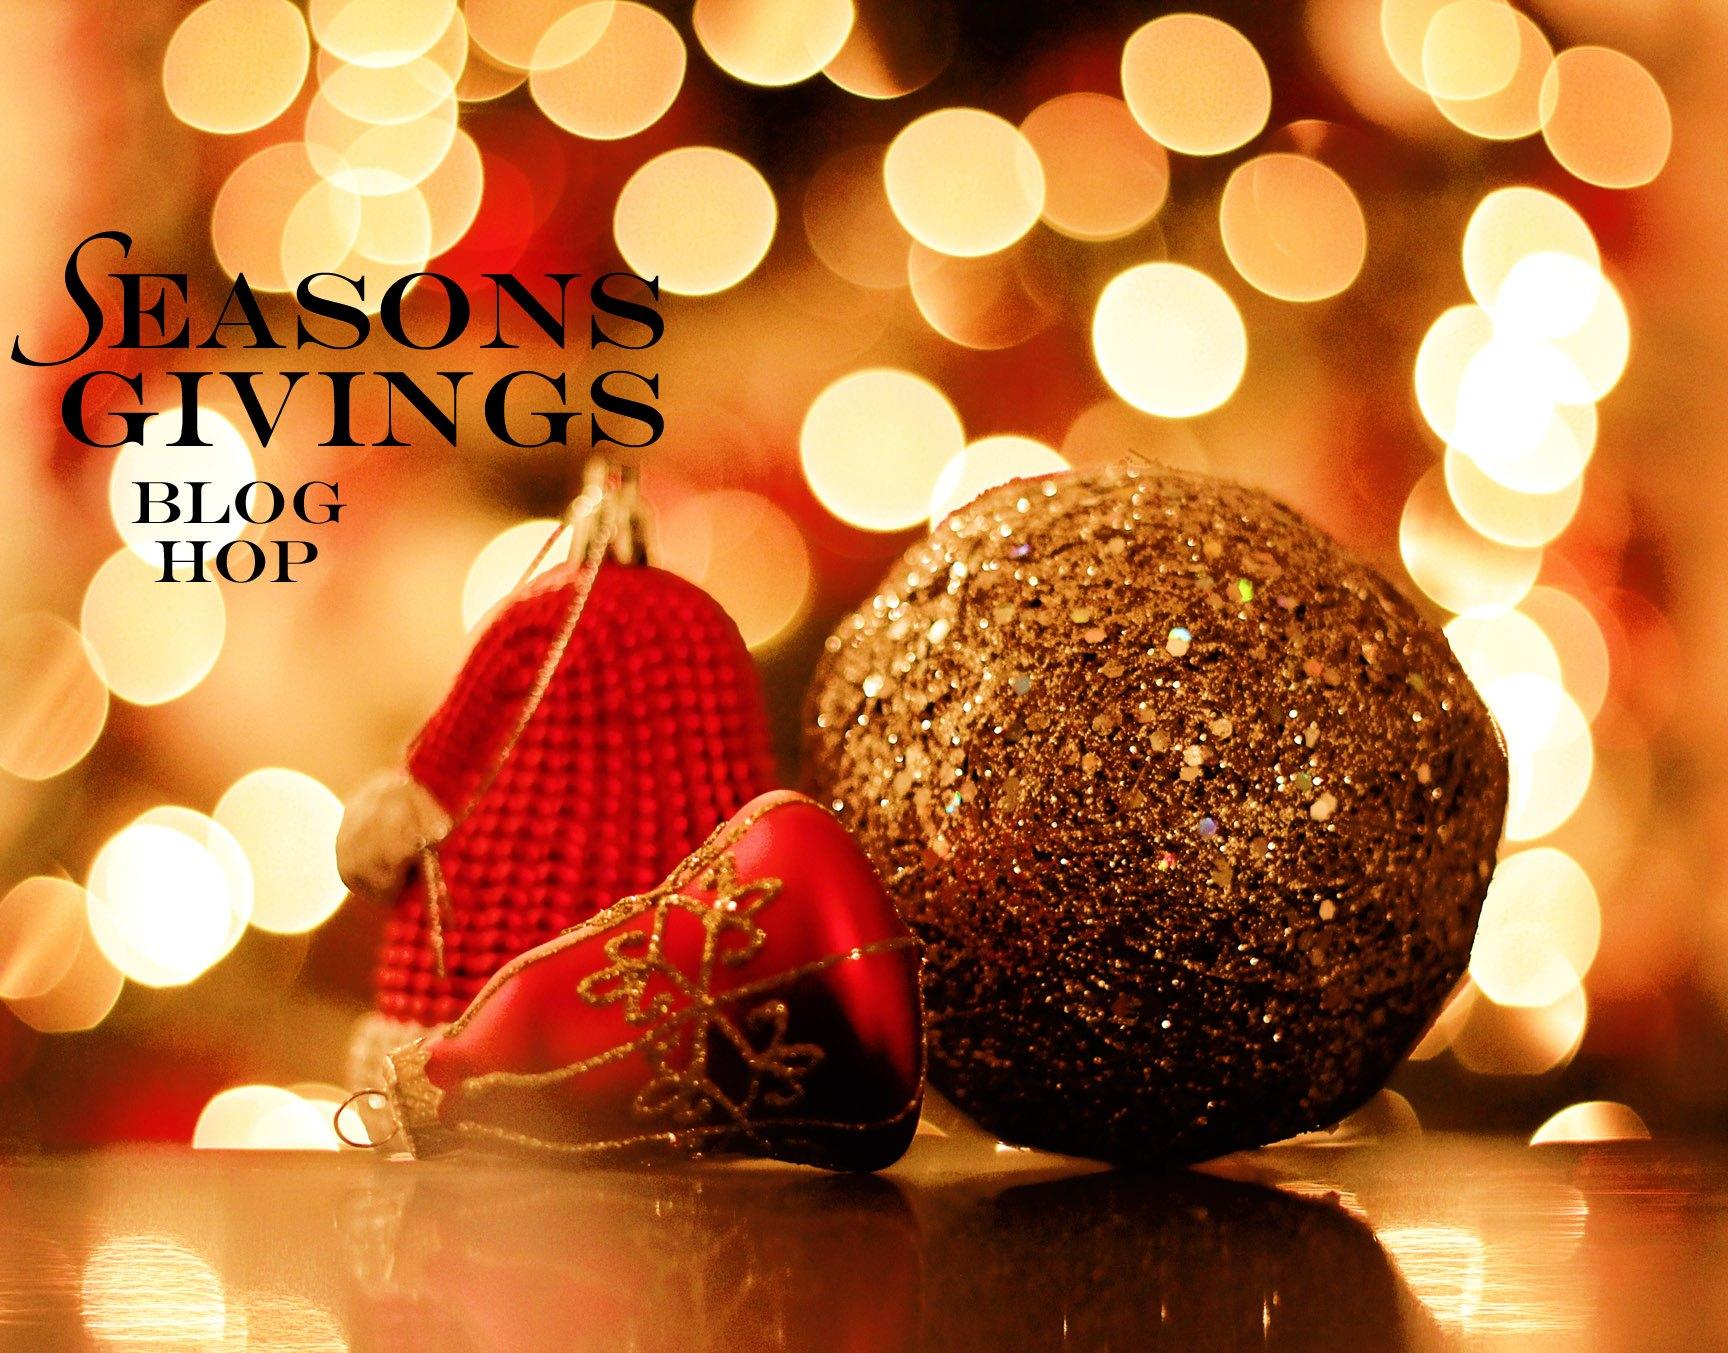 Seasons Givings